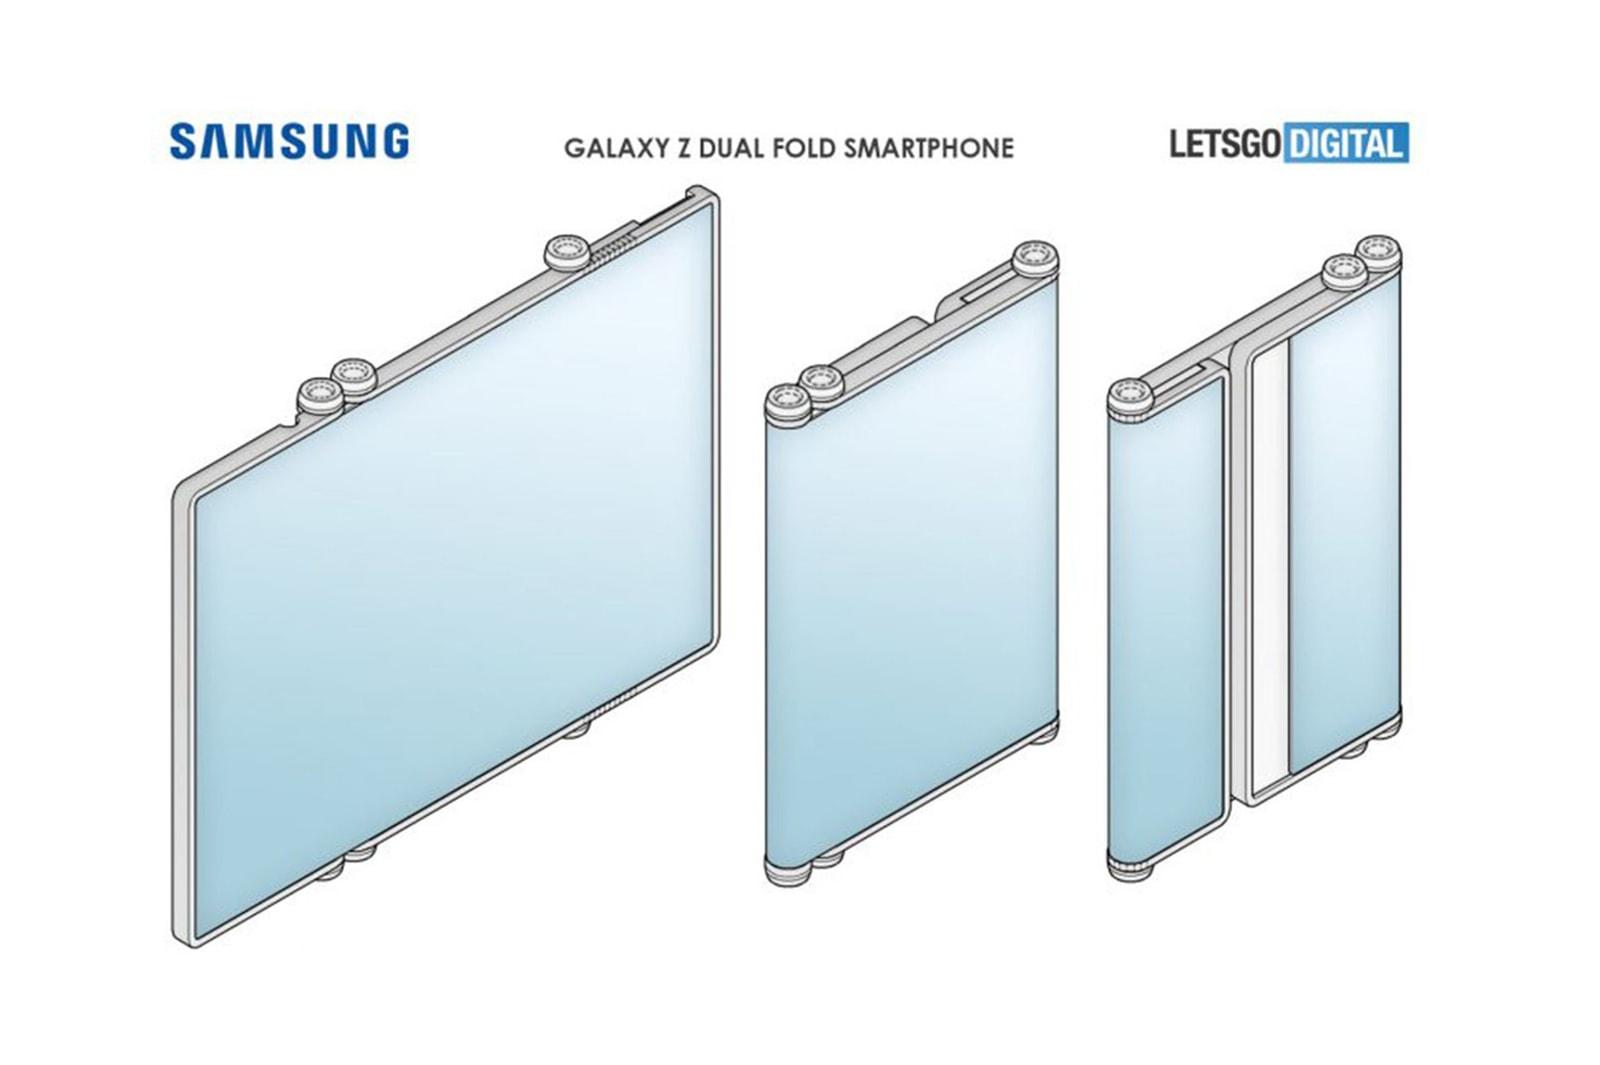 samsung galaxy z dual fold 5g tablet smartphone phone foldable screen tech